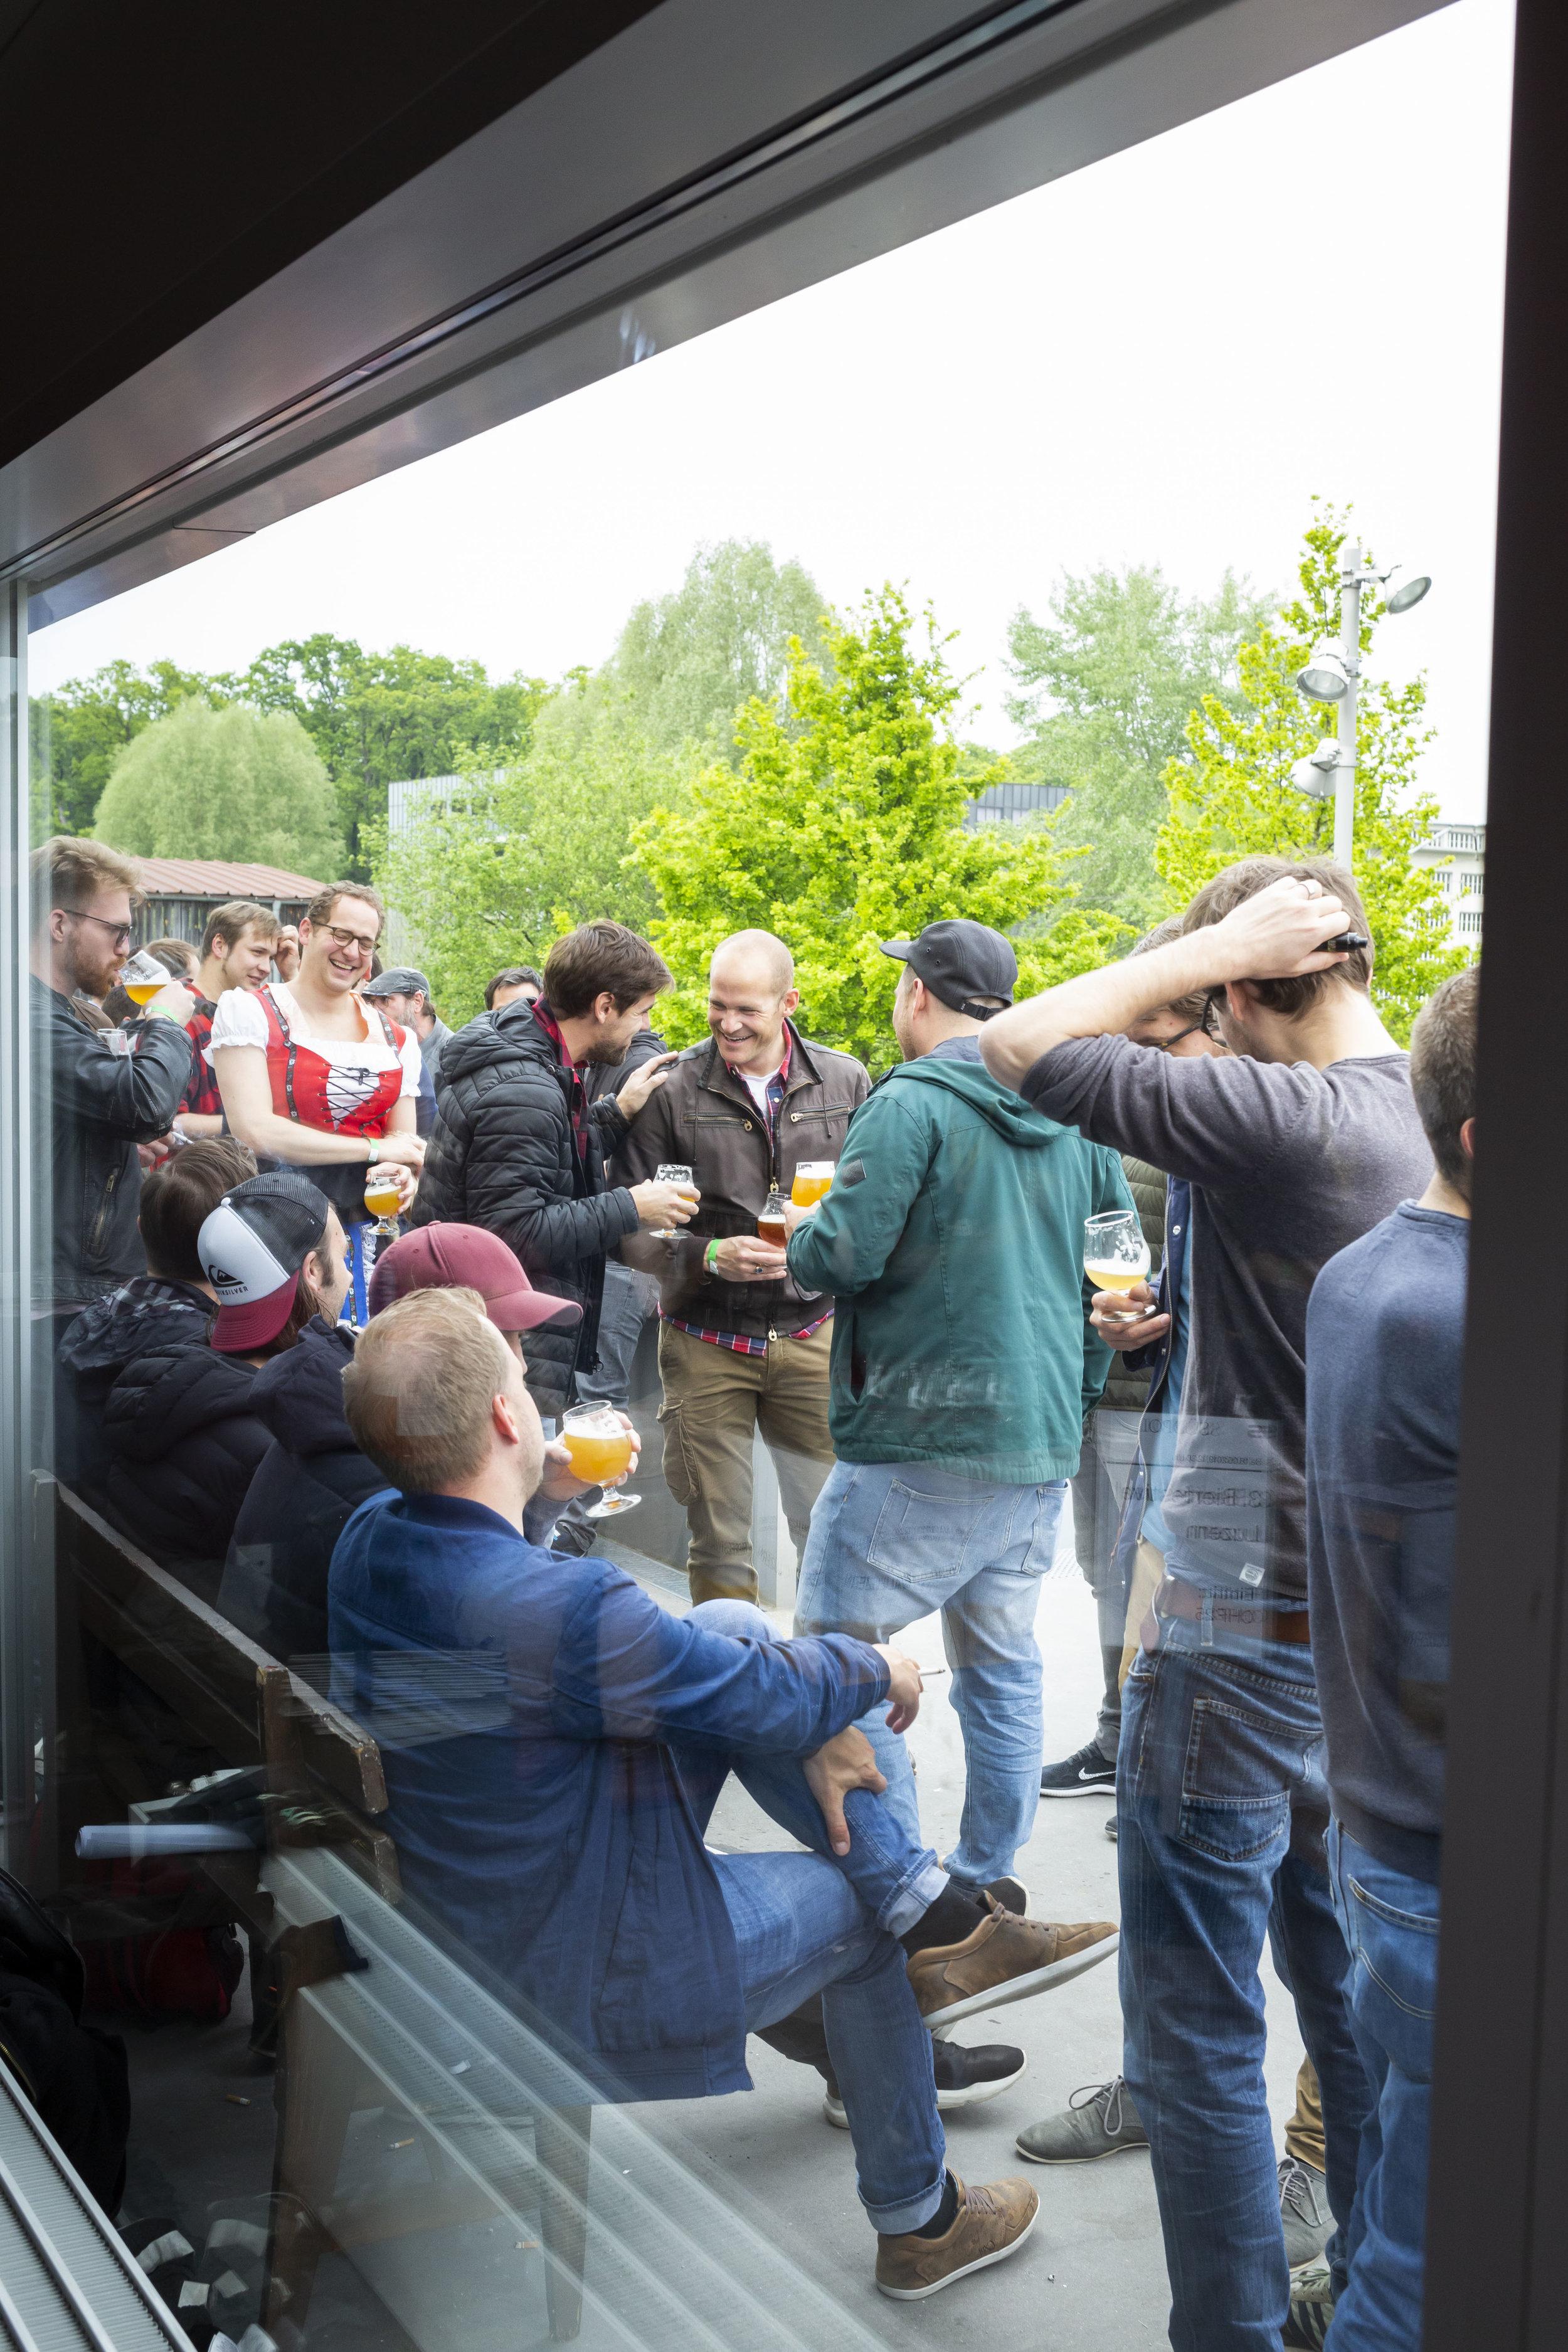 BierfestivalLuzern-7.jpg